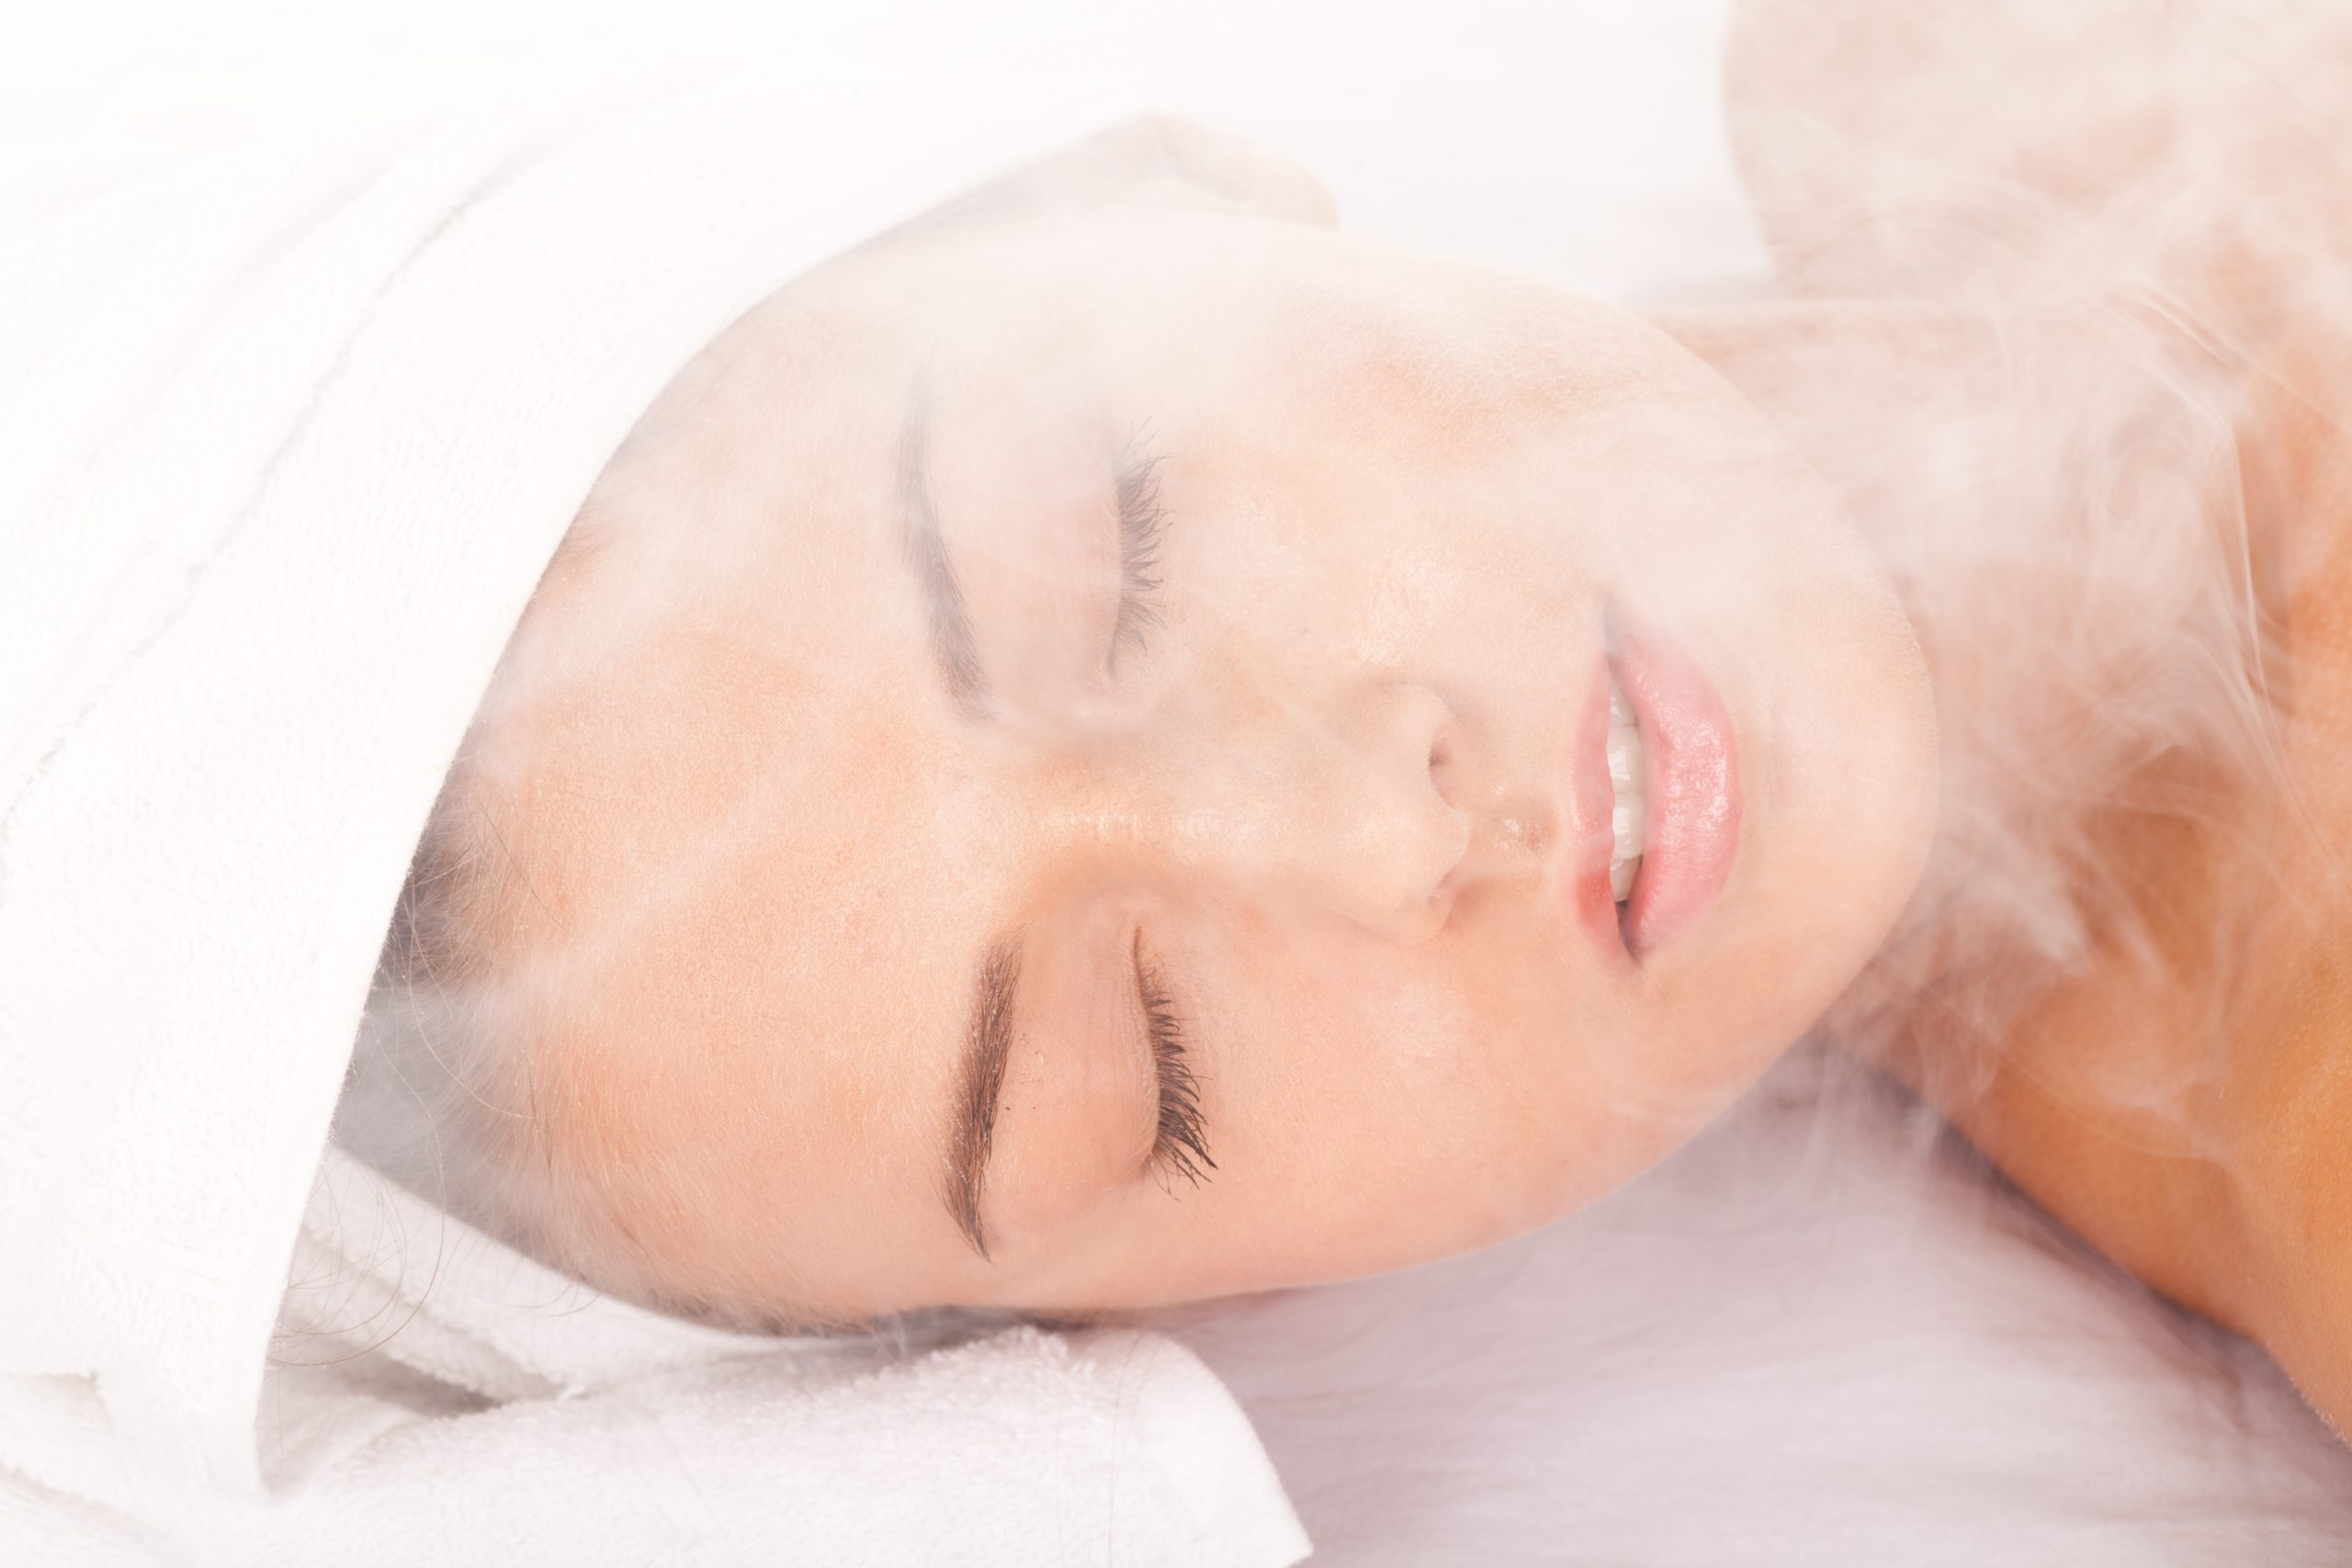 Woman with Sauna Steam